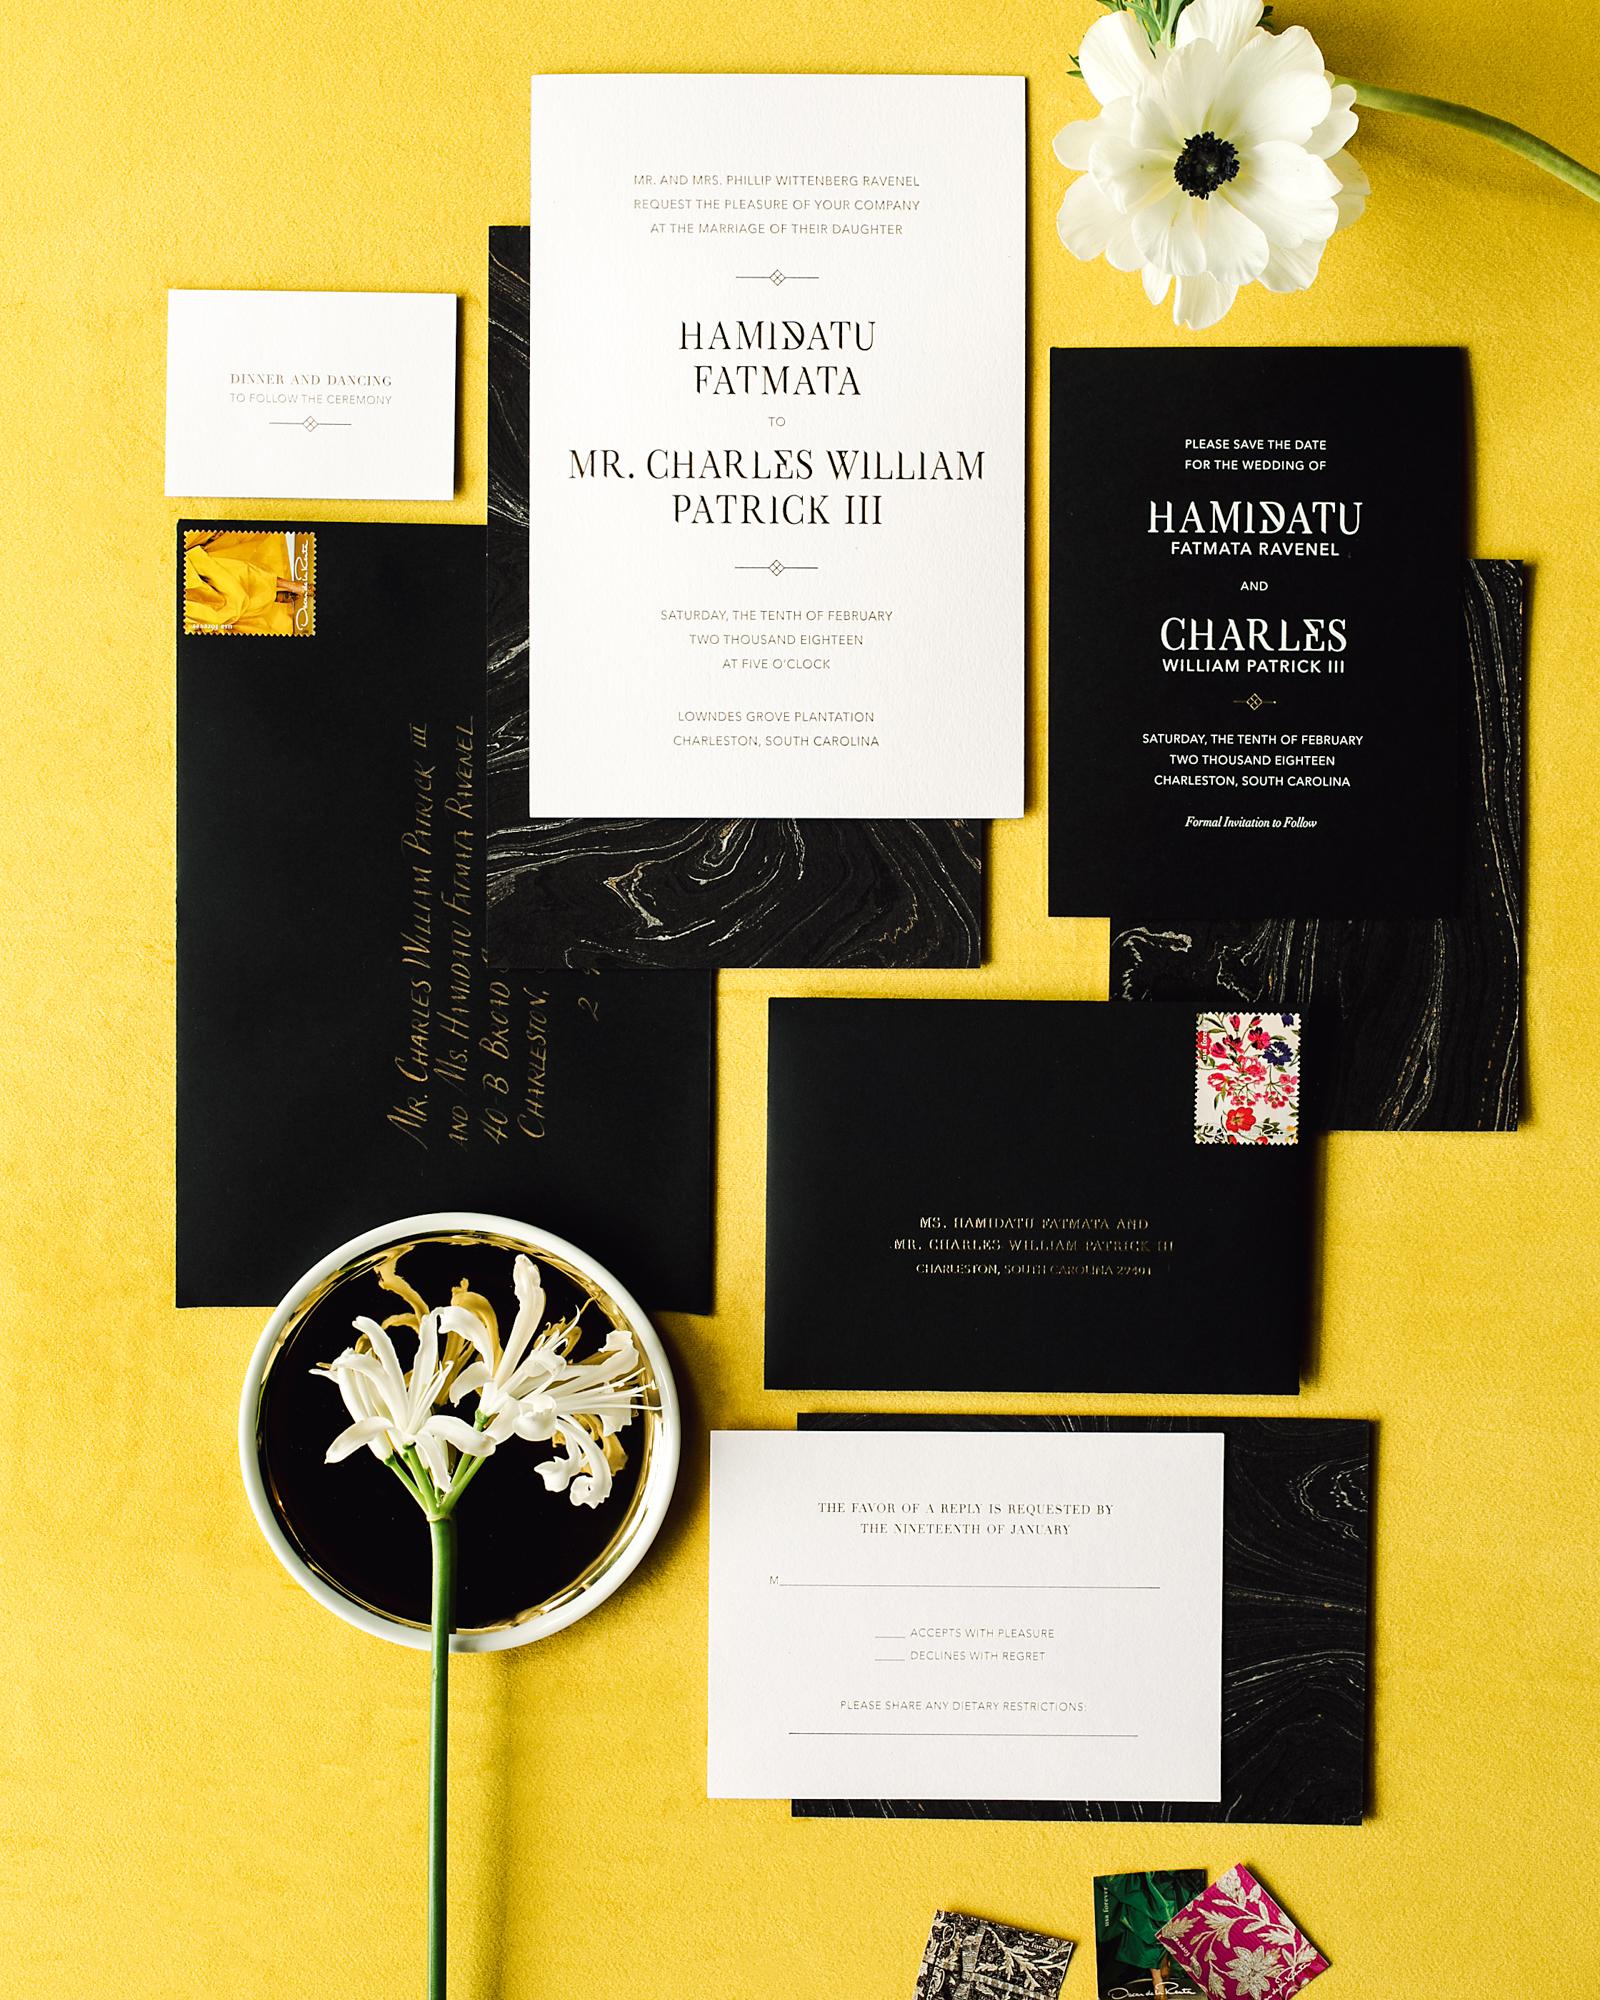 hamida charlie charleson wedding invitation marble